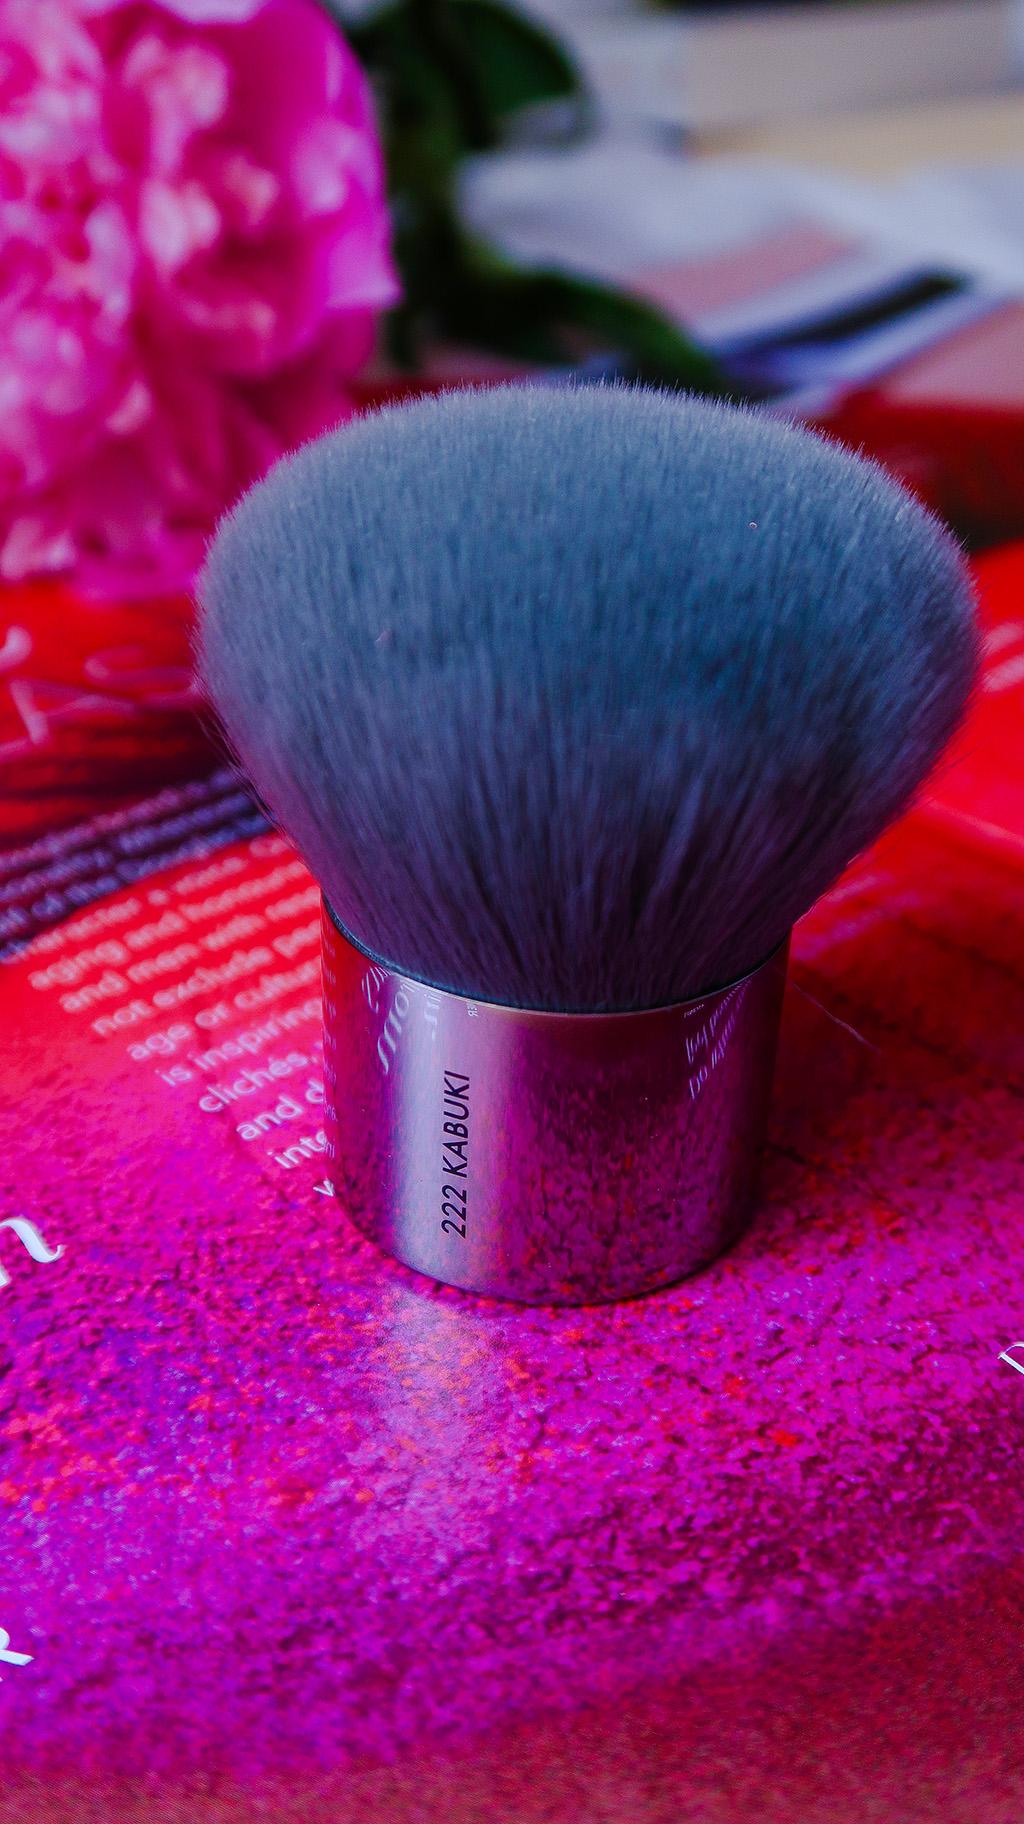 haul beauty douglas constanta mascara bronzer kabuki parfum